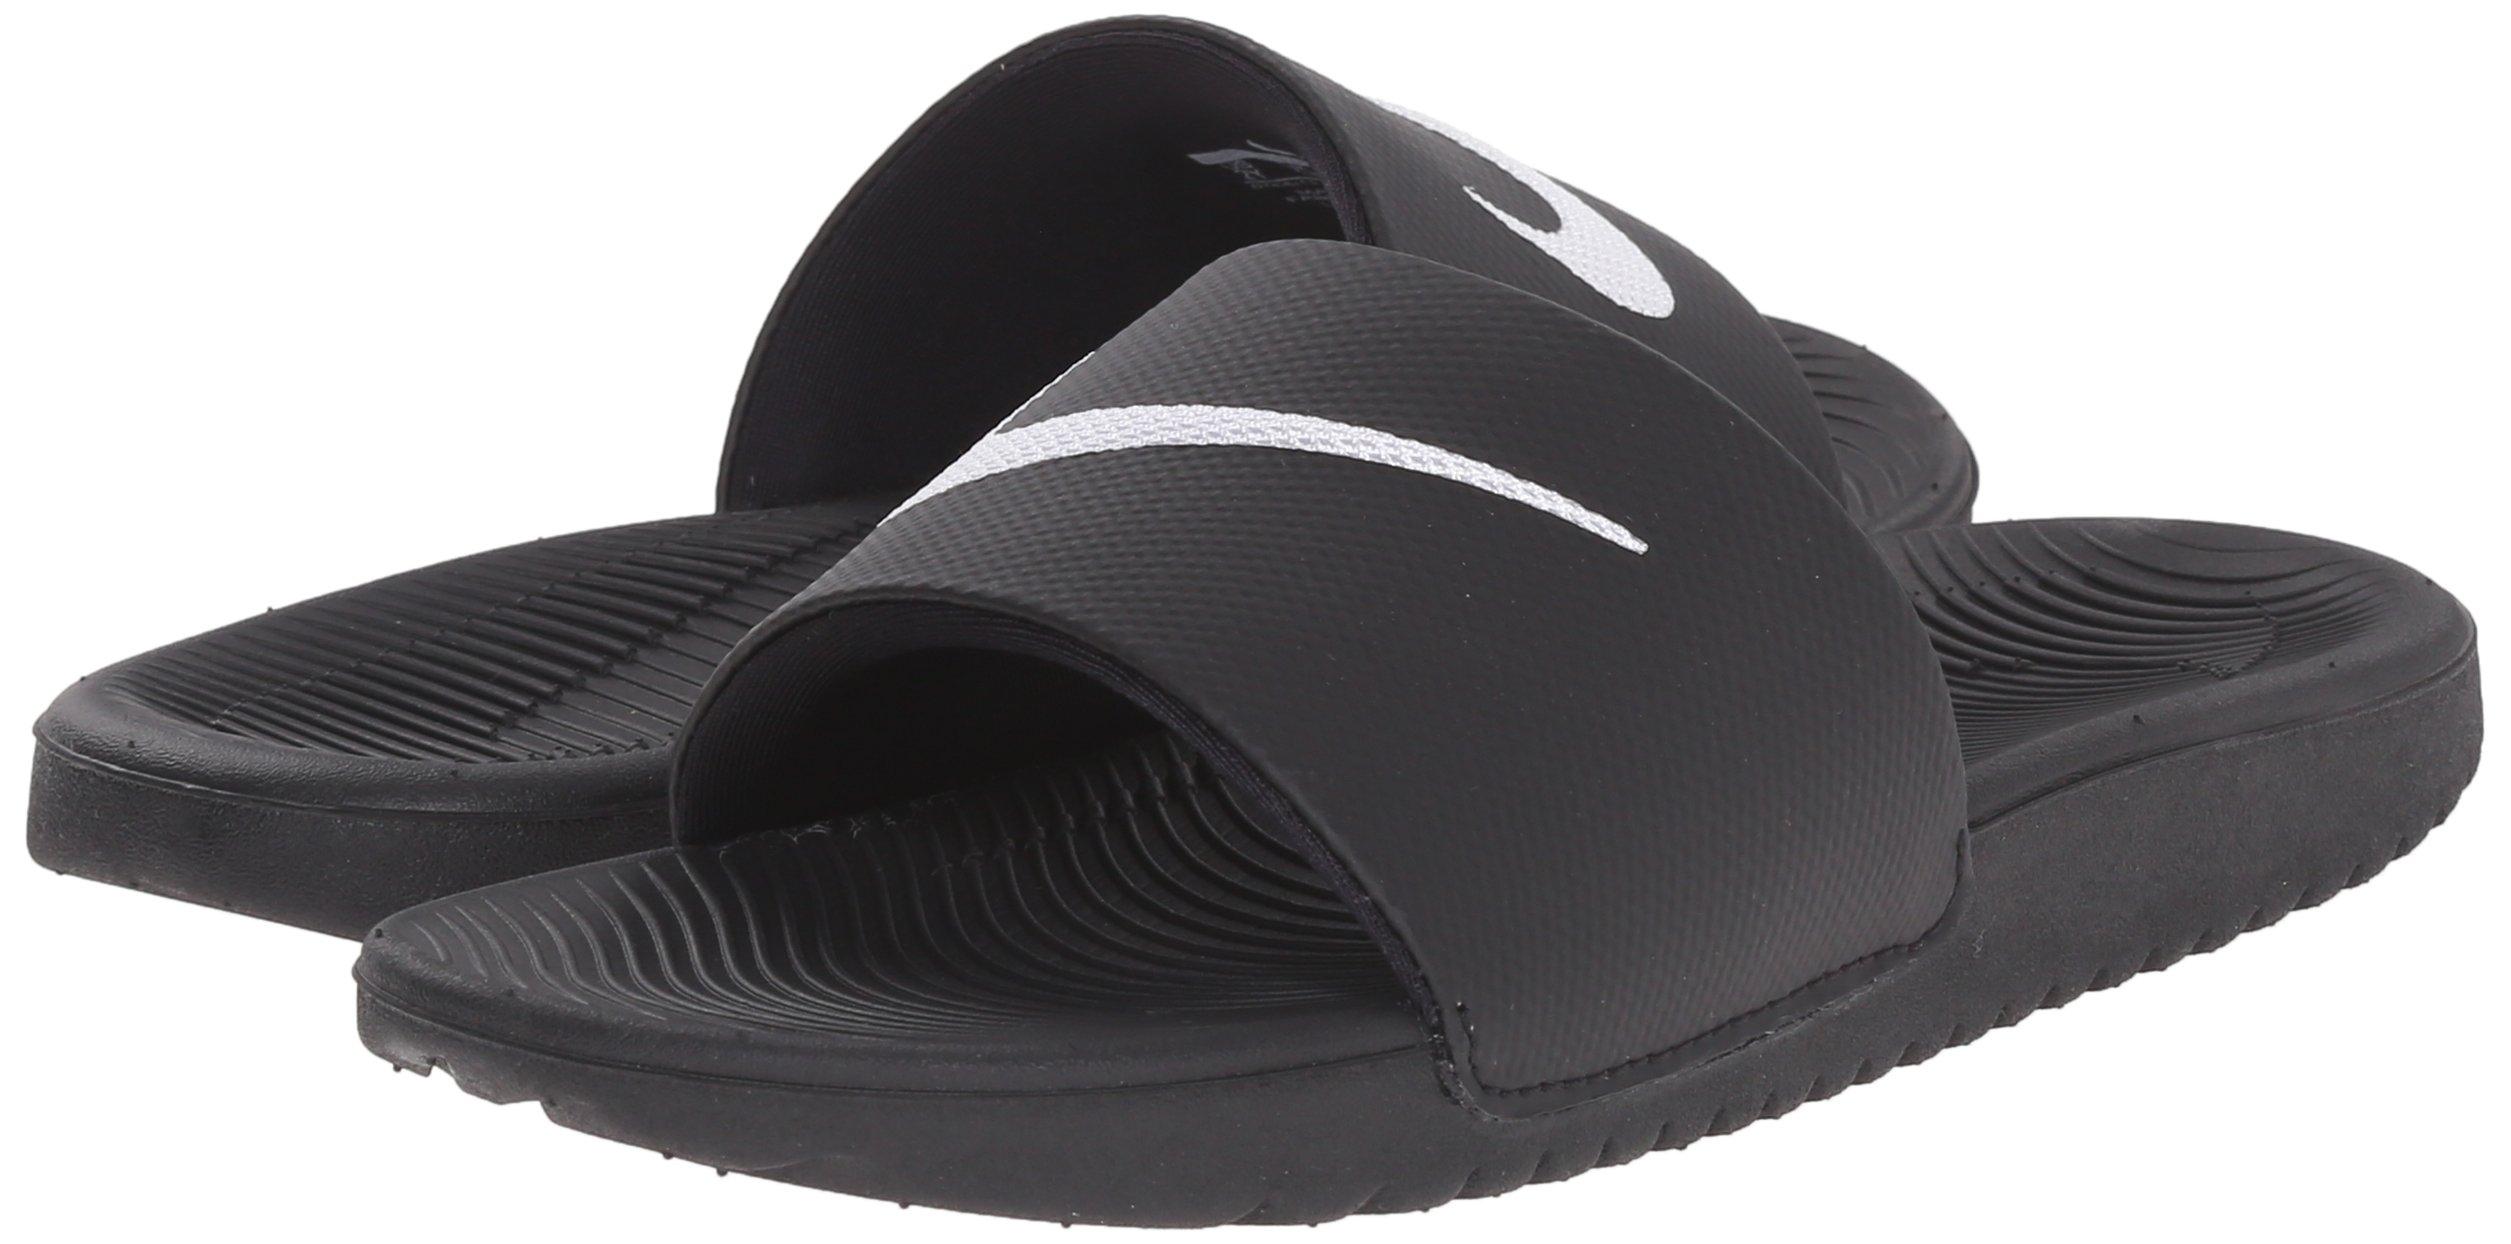 NIKE Kids' Kawa Slide Sandal, Black/White, 4 M US Big Kid by Nike (Image #6)